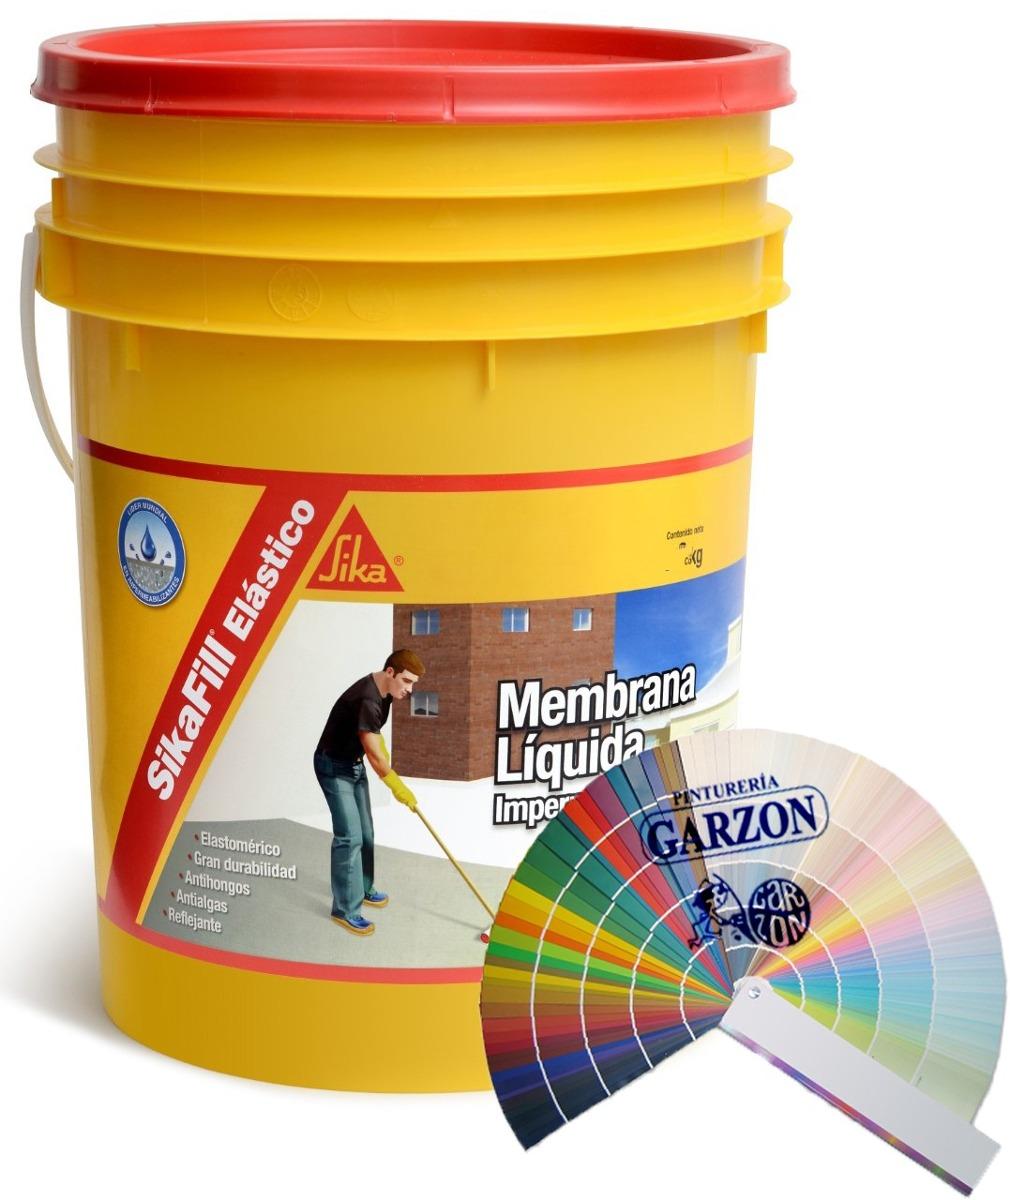 20k membrana impermeabilizante sika color pastel a - Sika pintura impermeabilizante ...